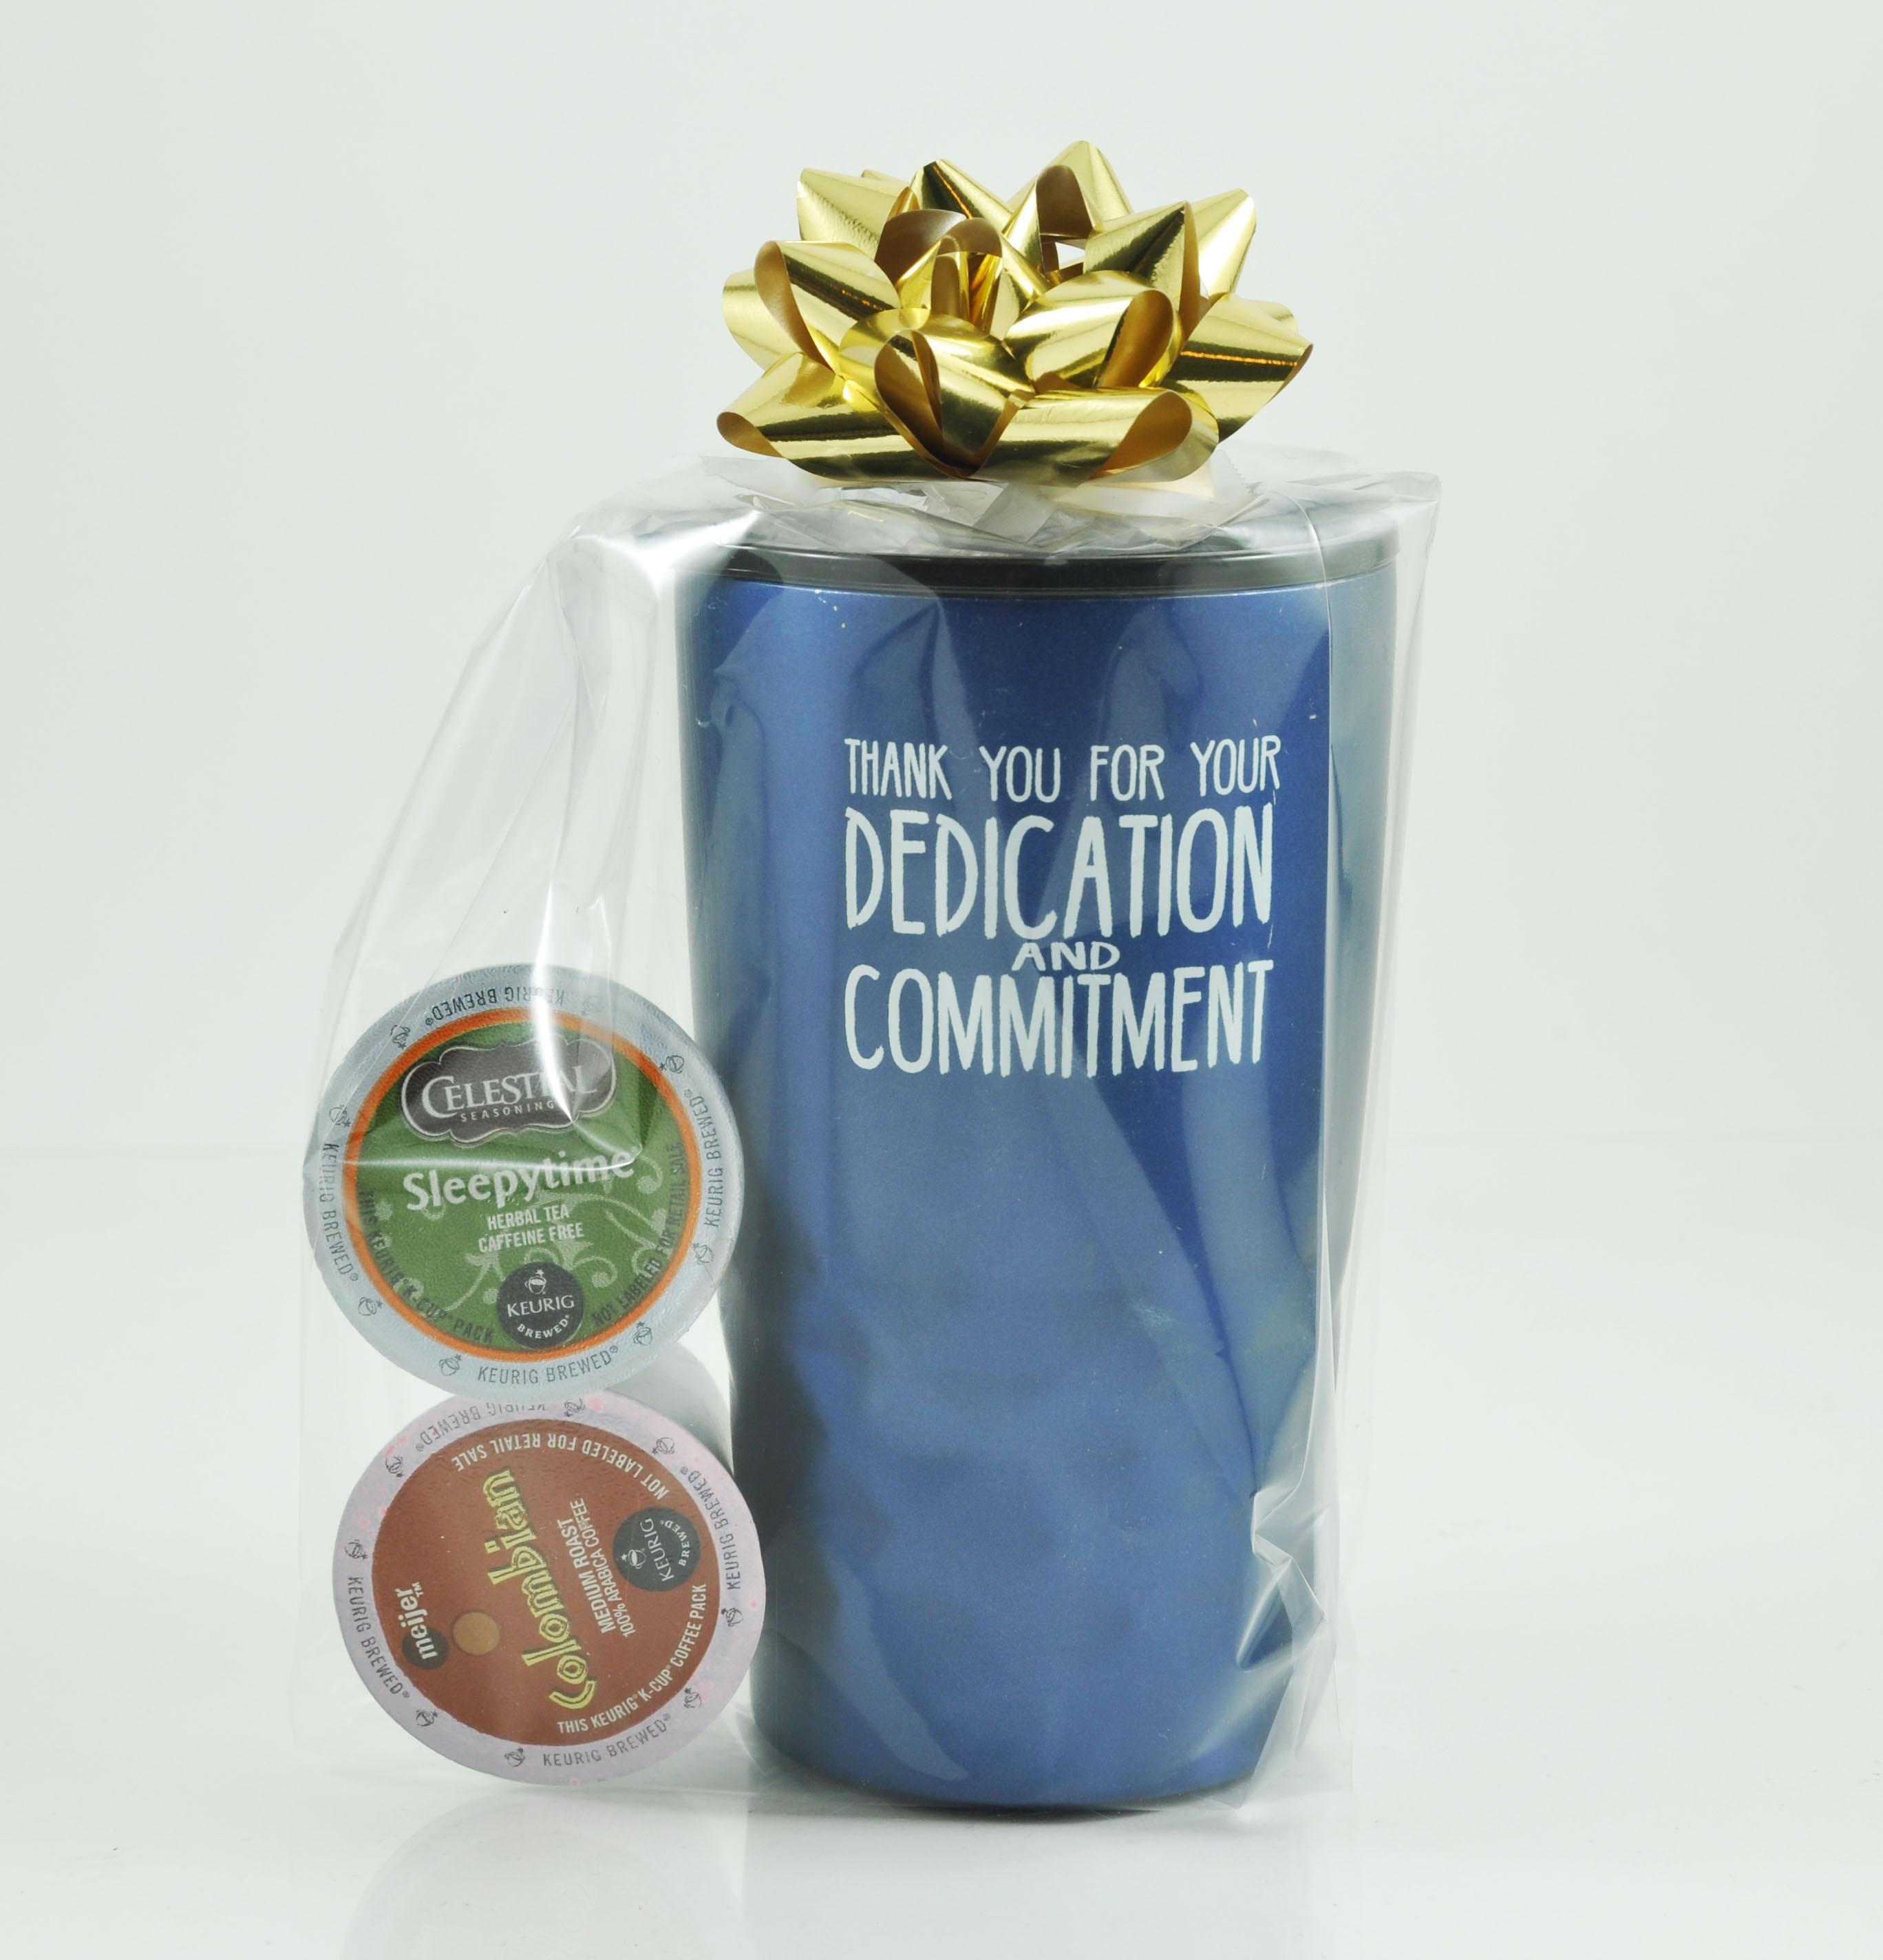 Kcup gift set.jpg